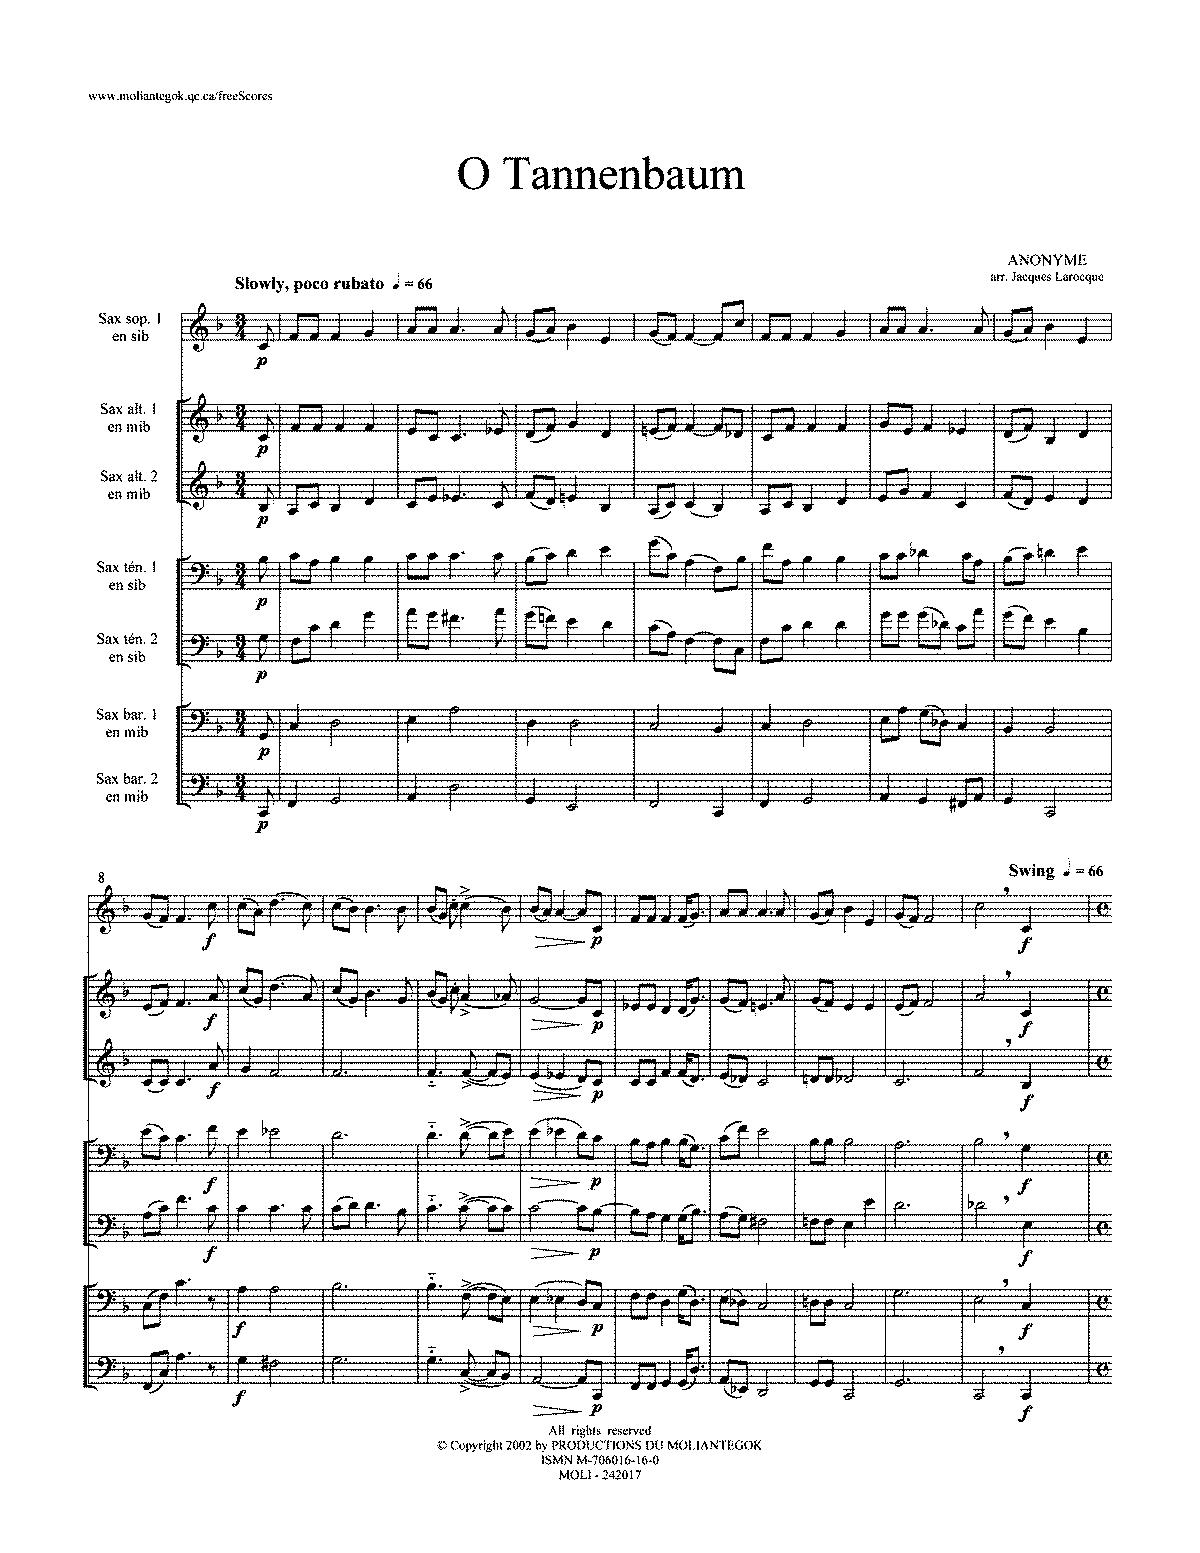 O Tannenbaum Sheet Music - Фото база